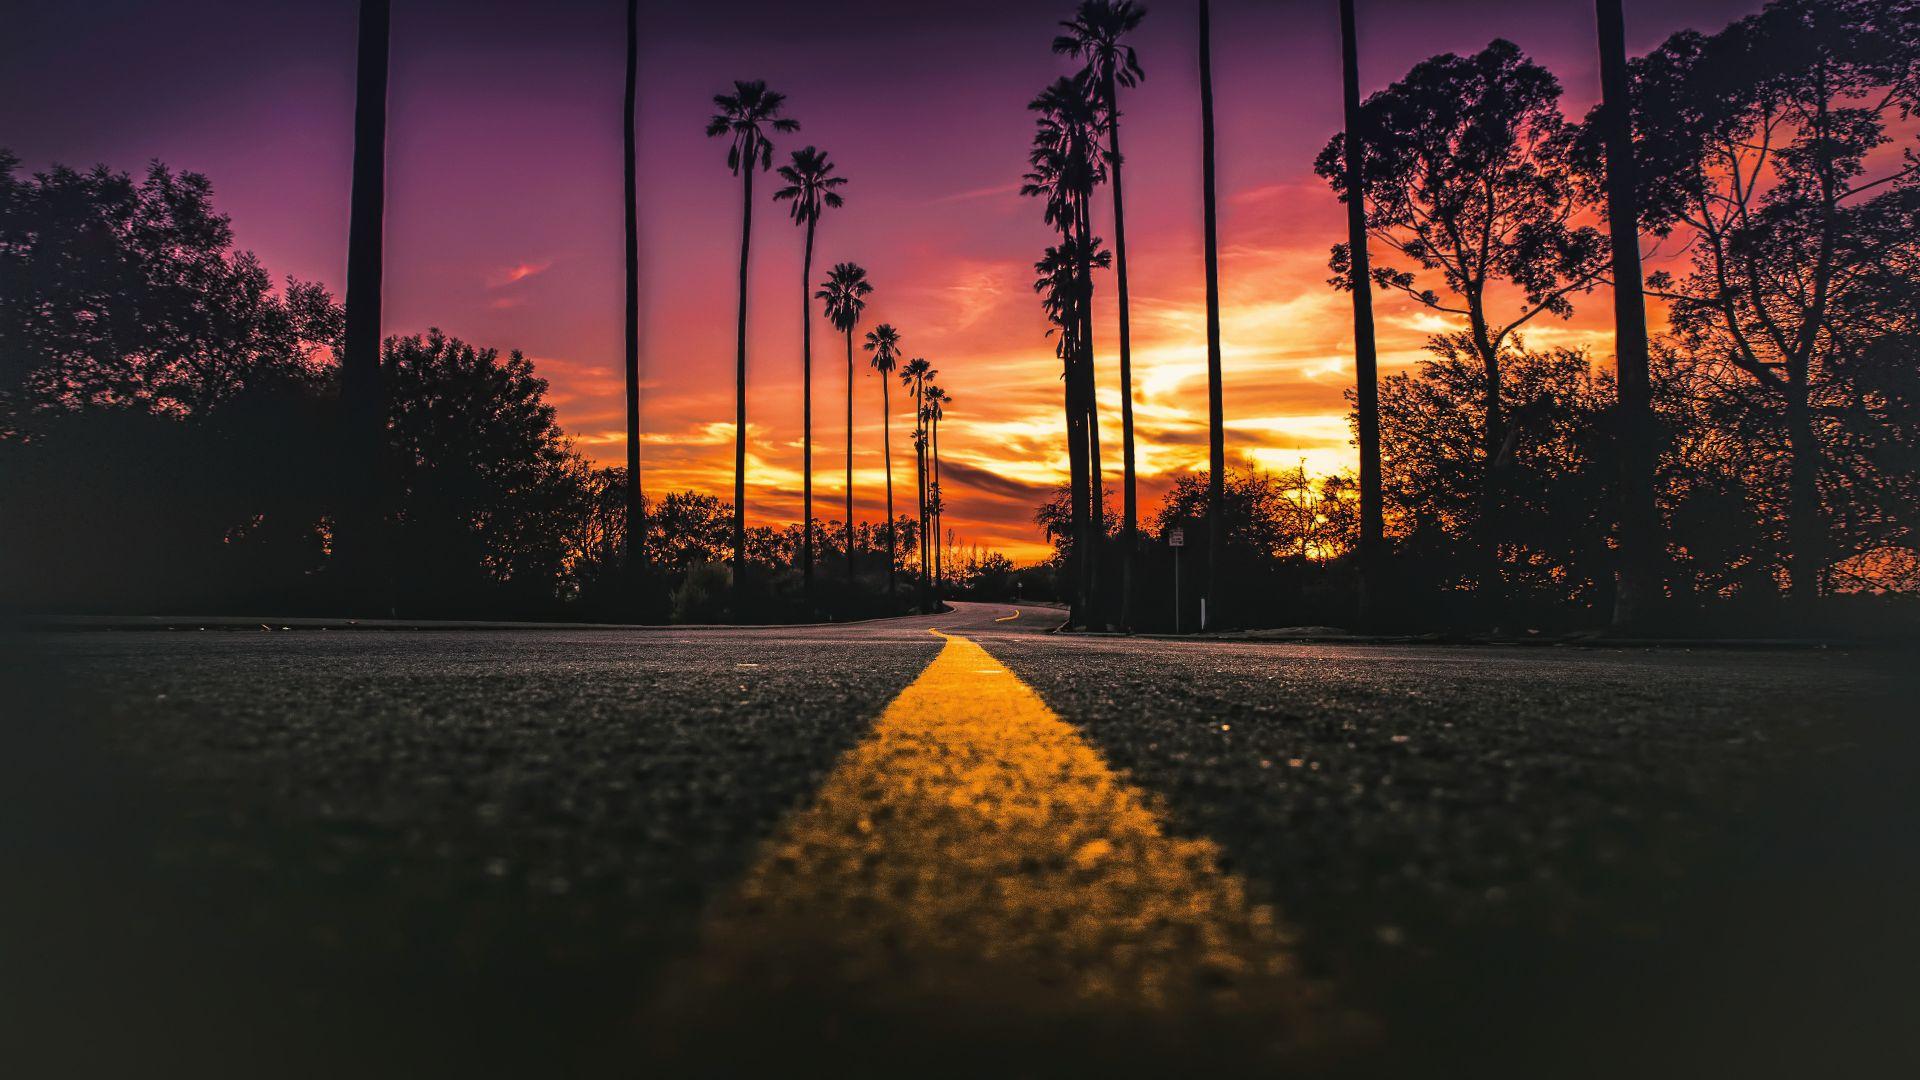 Wallpaper USA, road, highway, sunset, close up, 4k